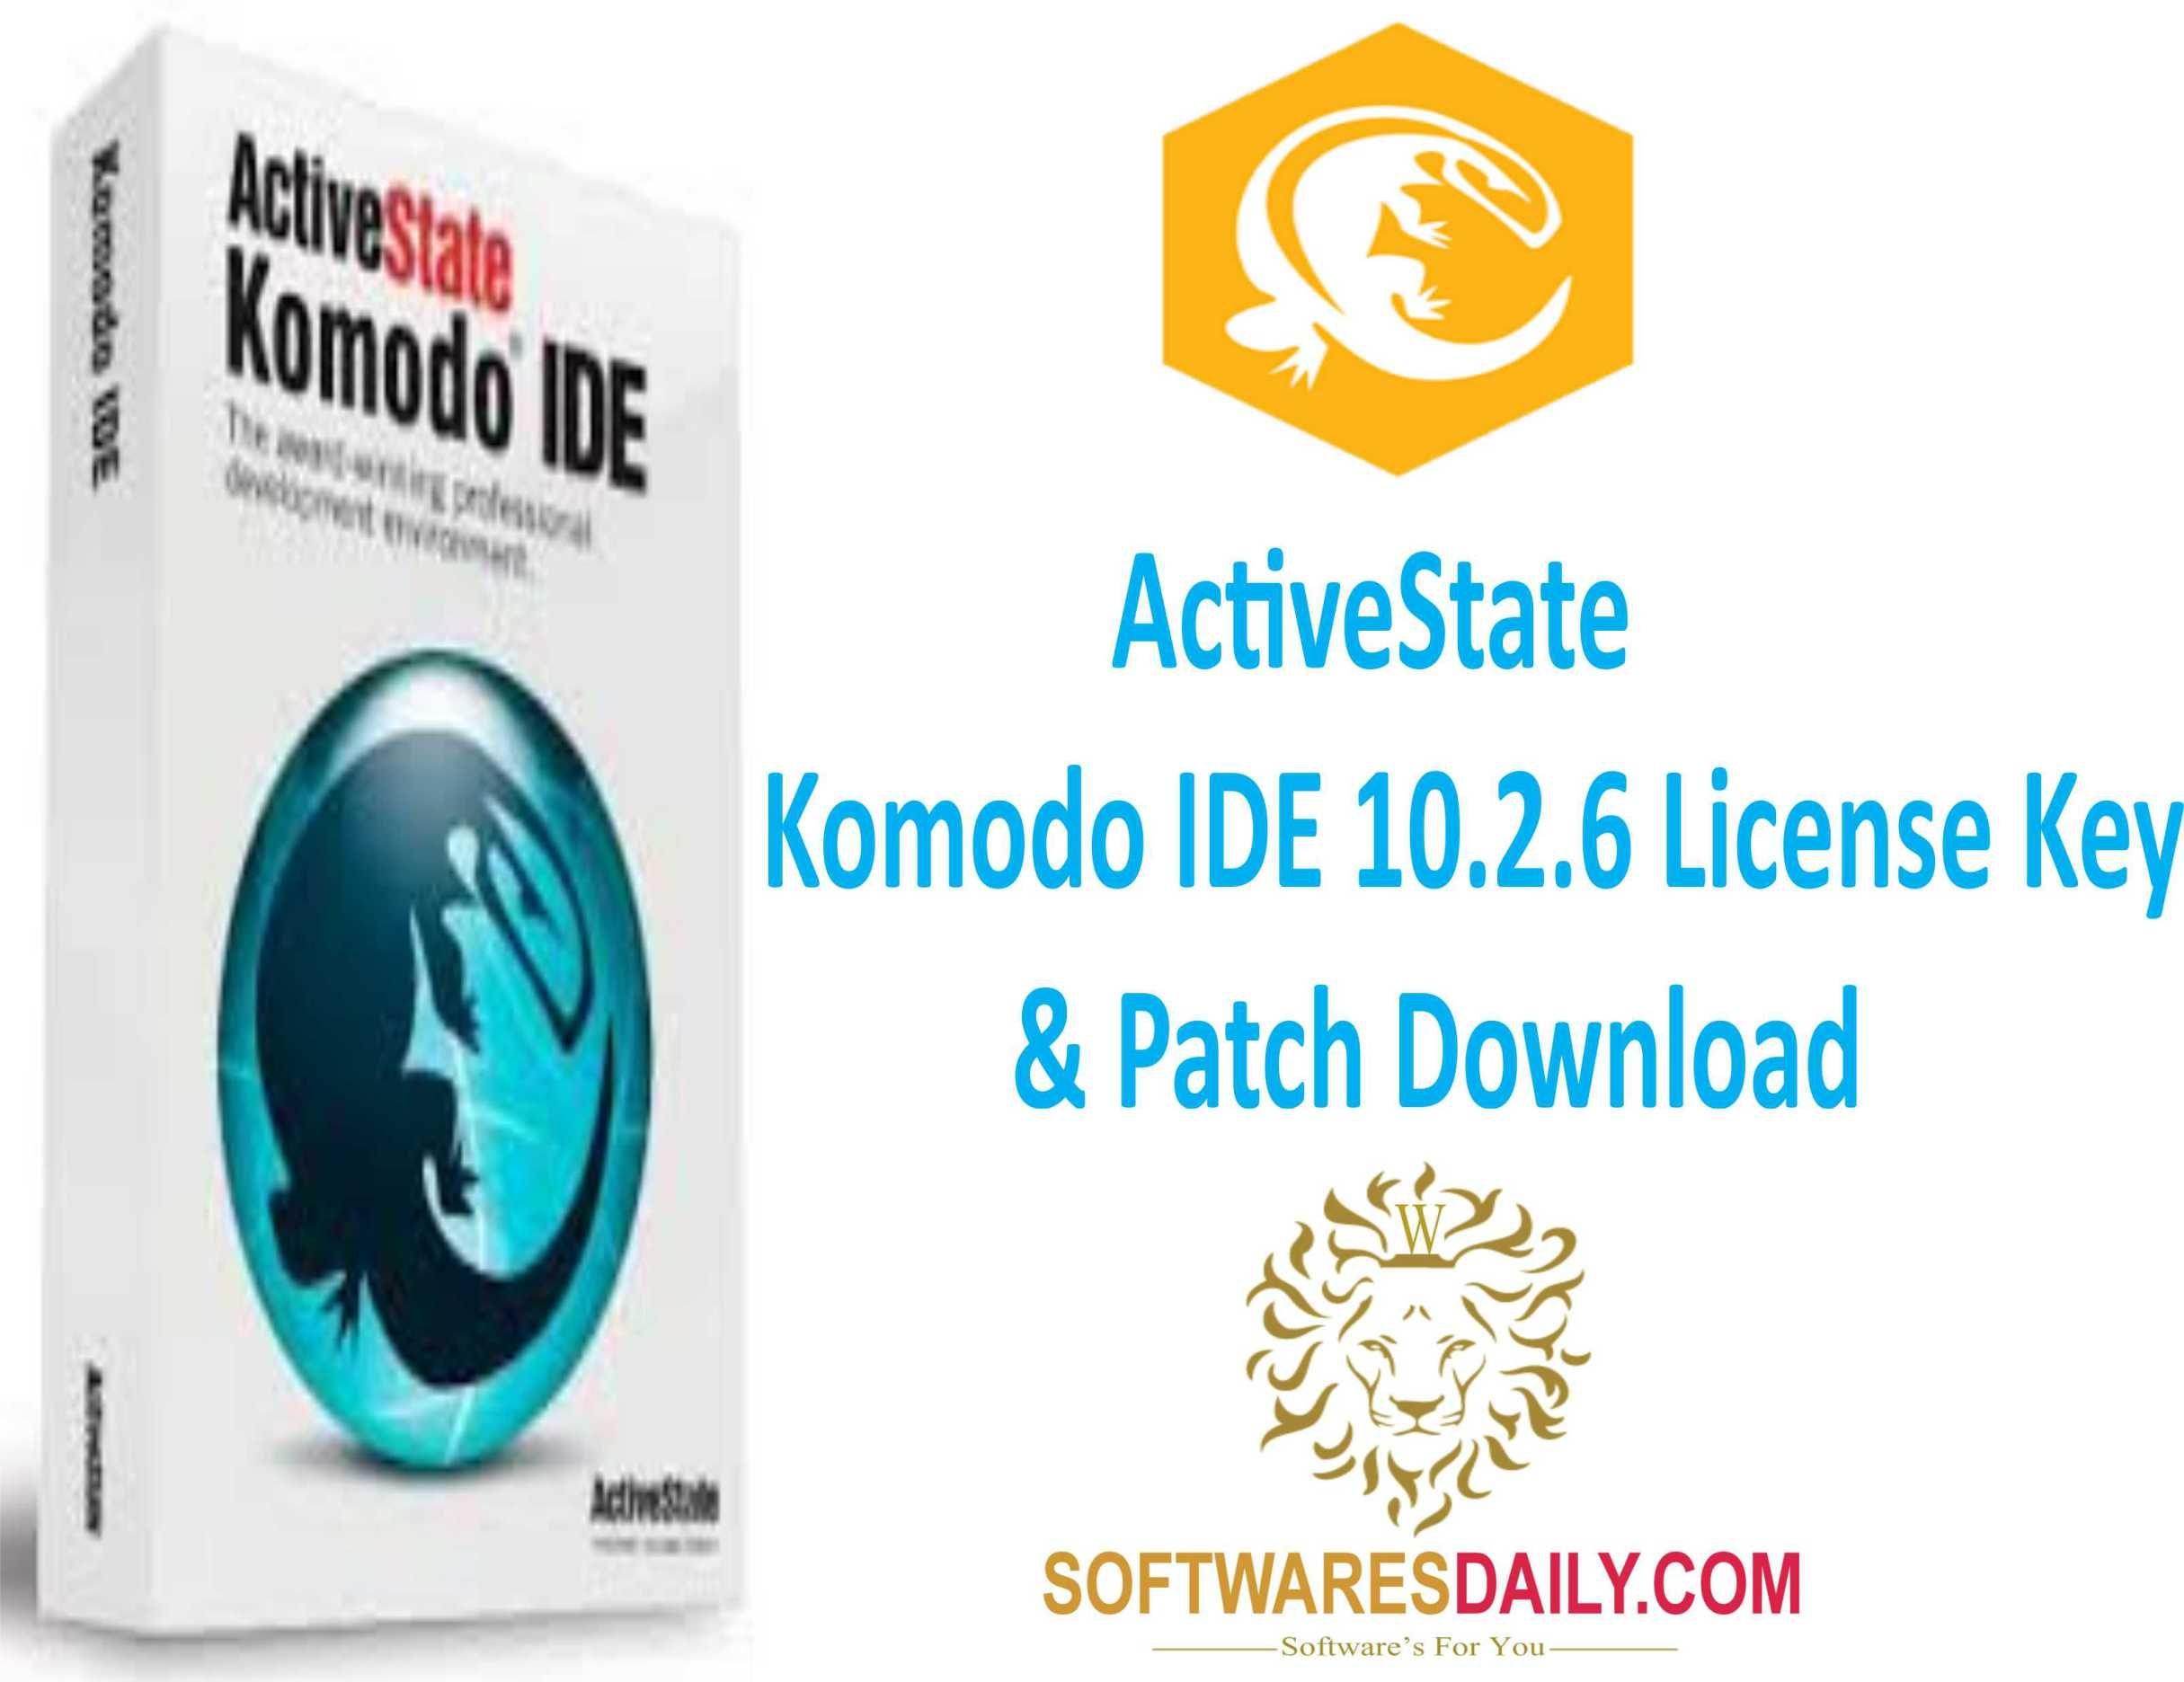 ActiveState Komodo IDE 10 2 6 License Key & Patch Download